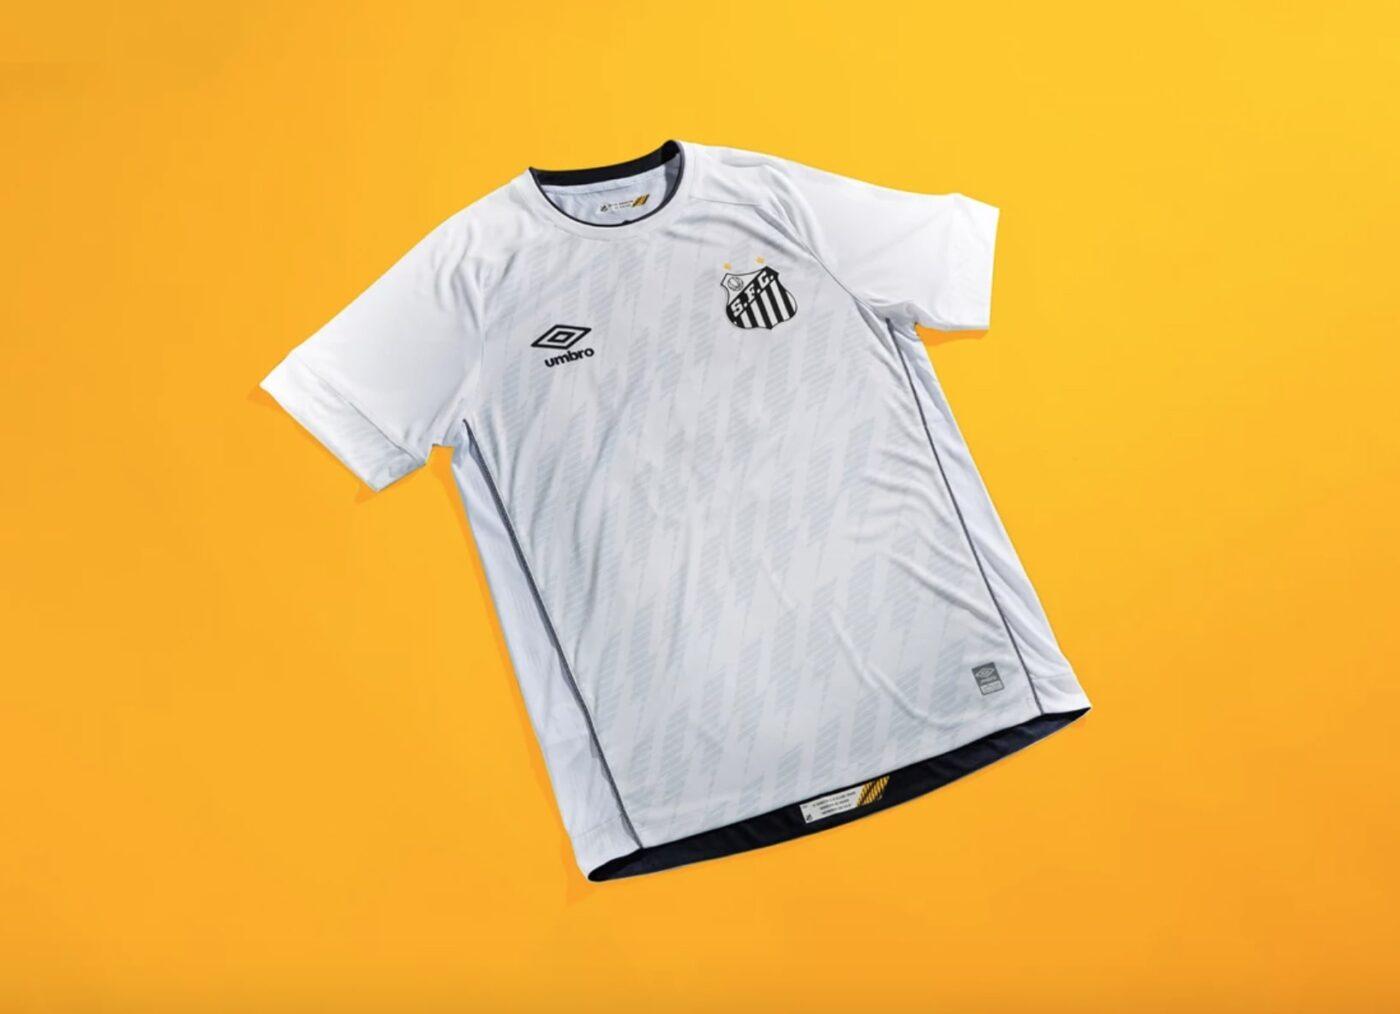 Maillot Santos domicile 2021-2022 Umbro